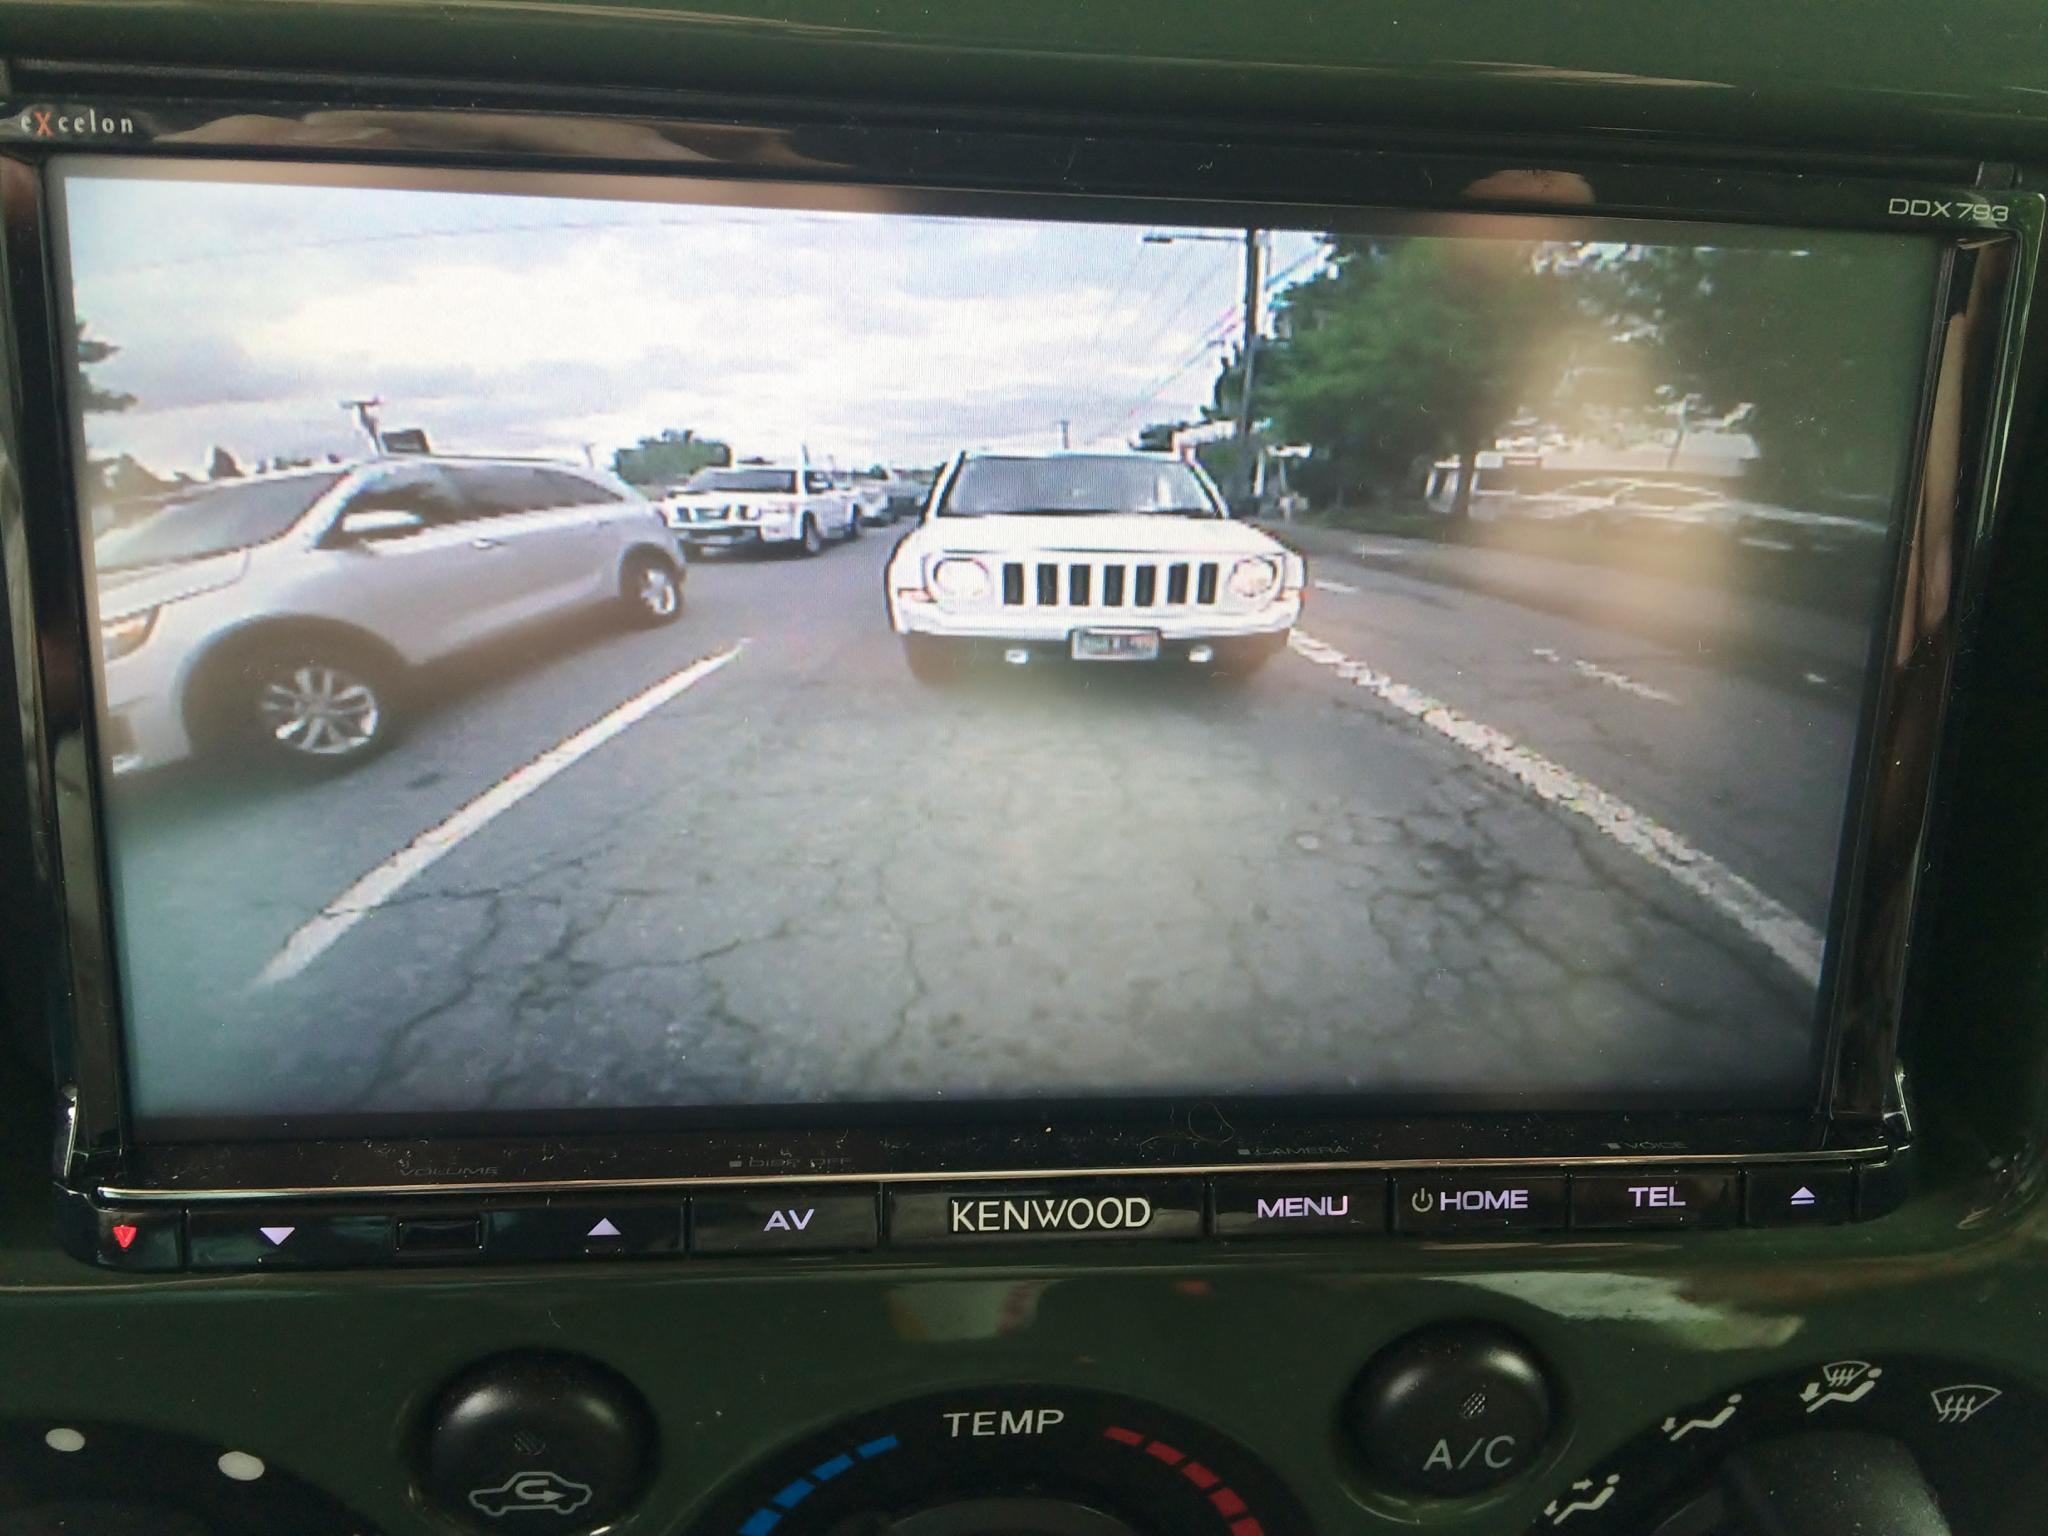 FJ Cruiser Back up camera--best one? - Toyota FJ Cruiser Forum